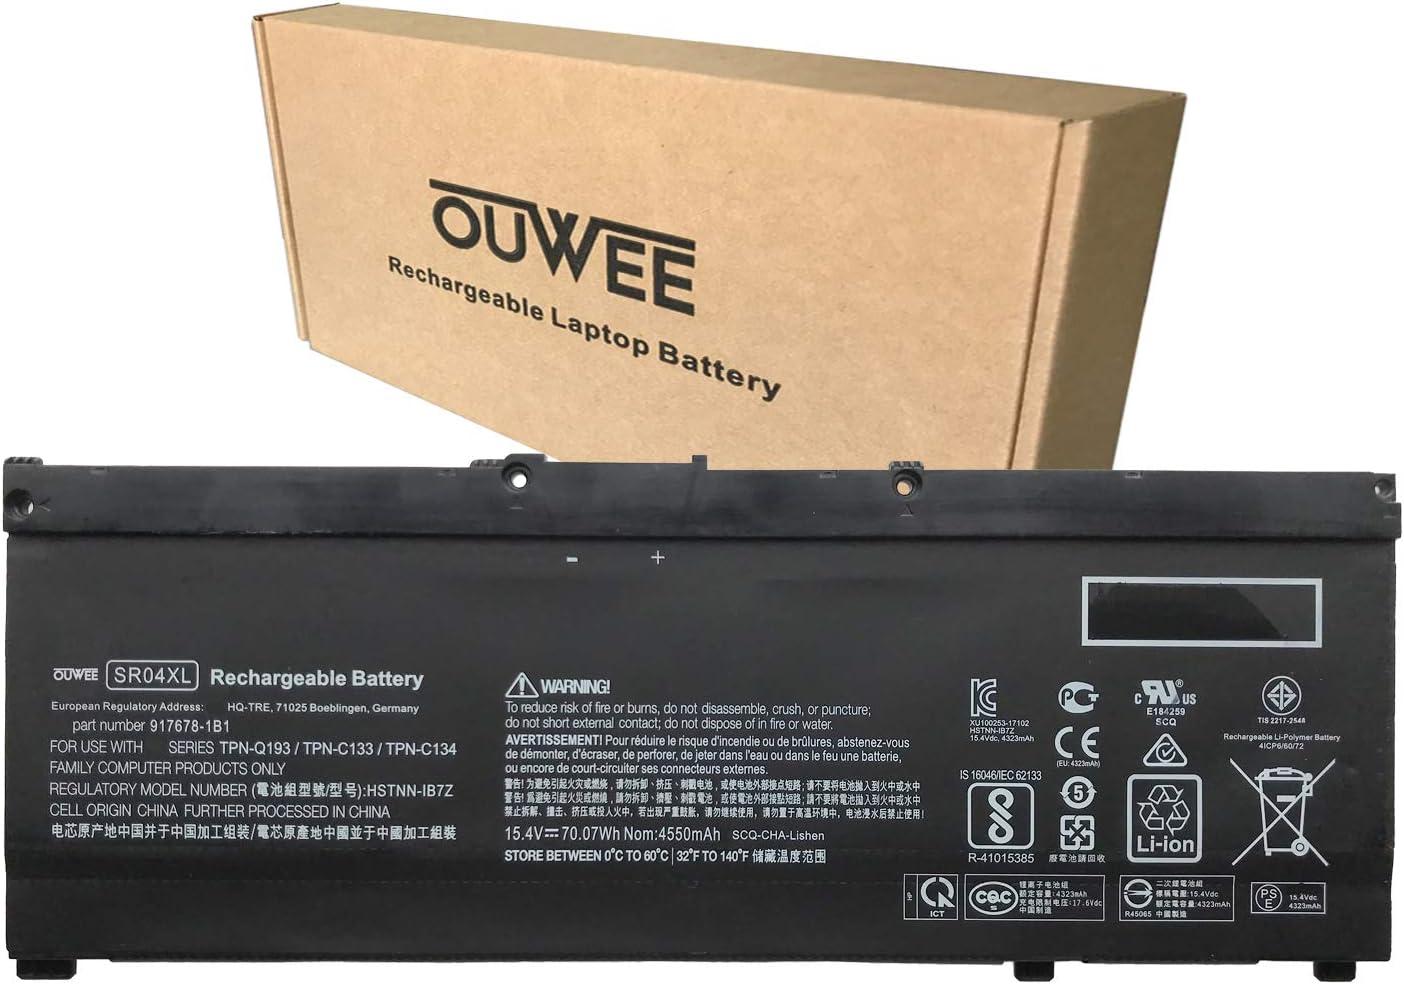 OUWEE SR04XL Laptop Battery Compatible with HP Pavilion 15-CB000 Power 15-CB000 Omen 15-CE000 15-CE015DX 15-DC0000 Series 917678-1B1 HSTNN-IB7Z HSTNN-DB7W 917724-855 917678-2B1 15.4V 70.07Wh